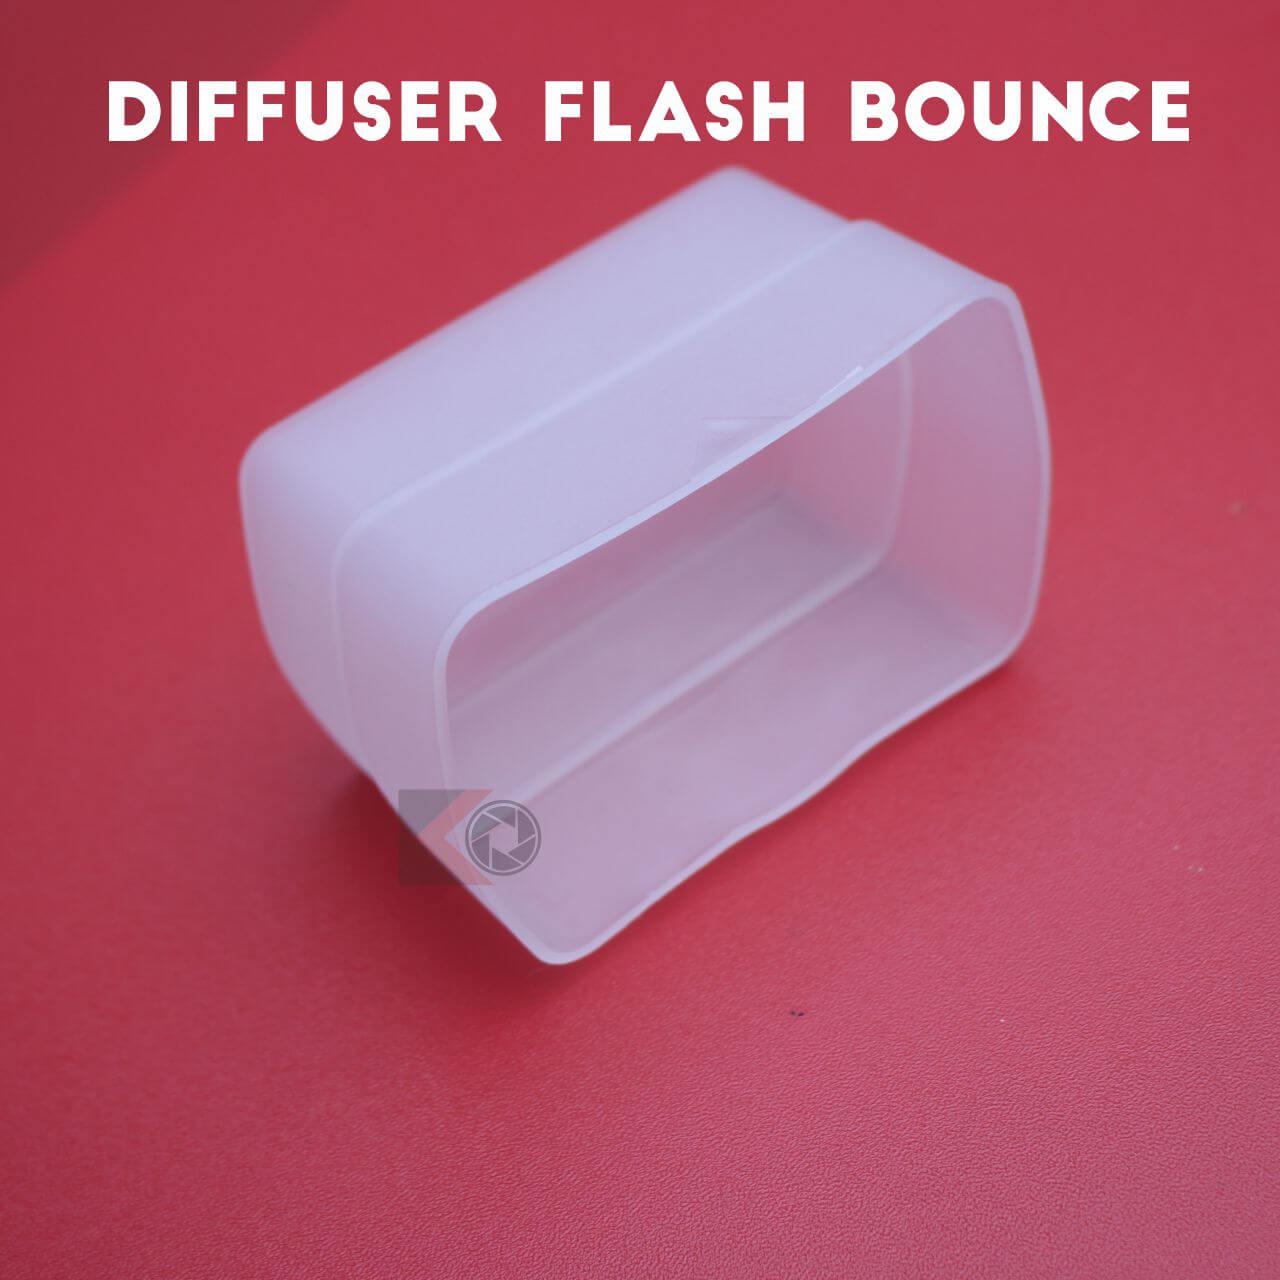 Jual Flash Diffuser Bouncer Batamkamera